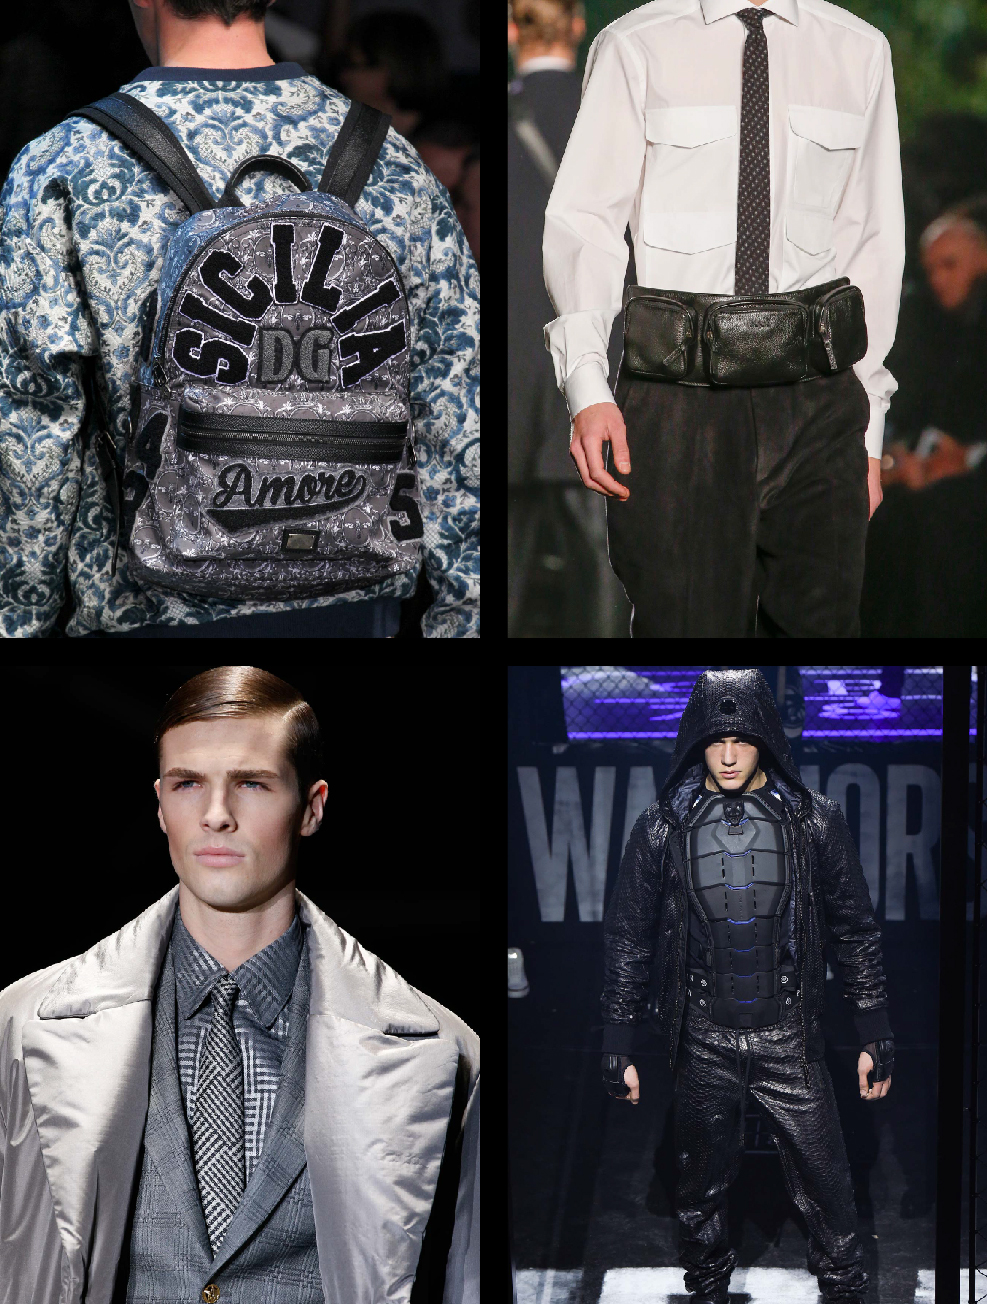 Milán Fashion Week Mens Fall Winter 2015, parte I